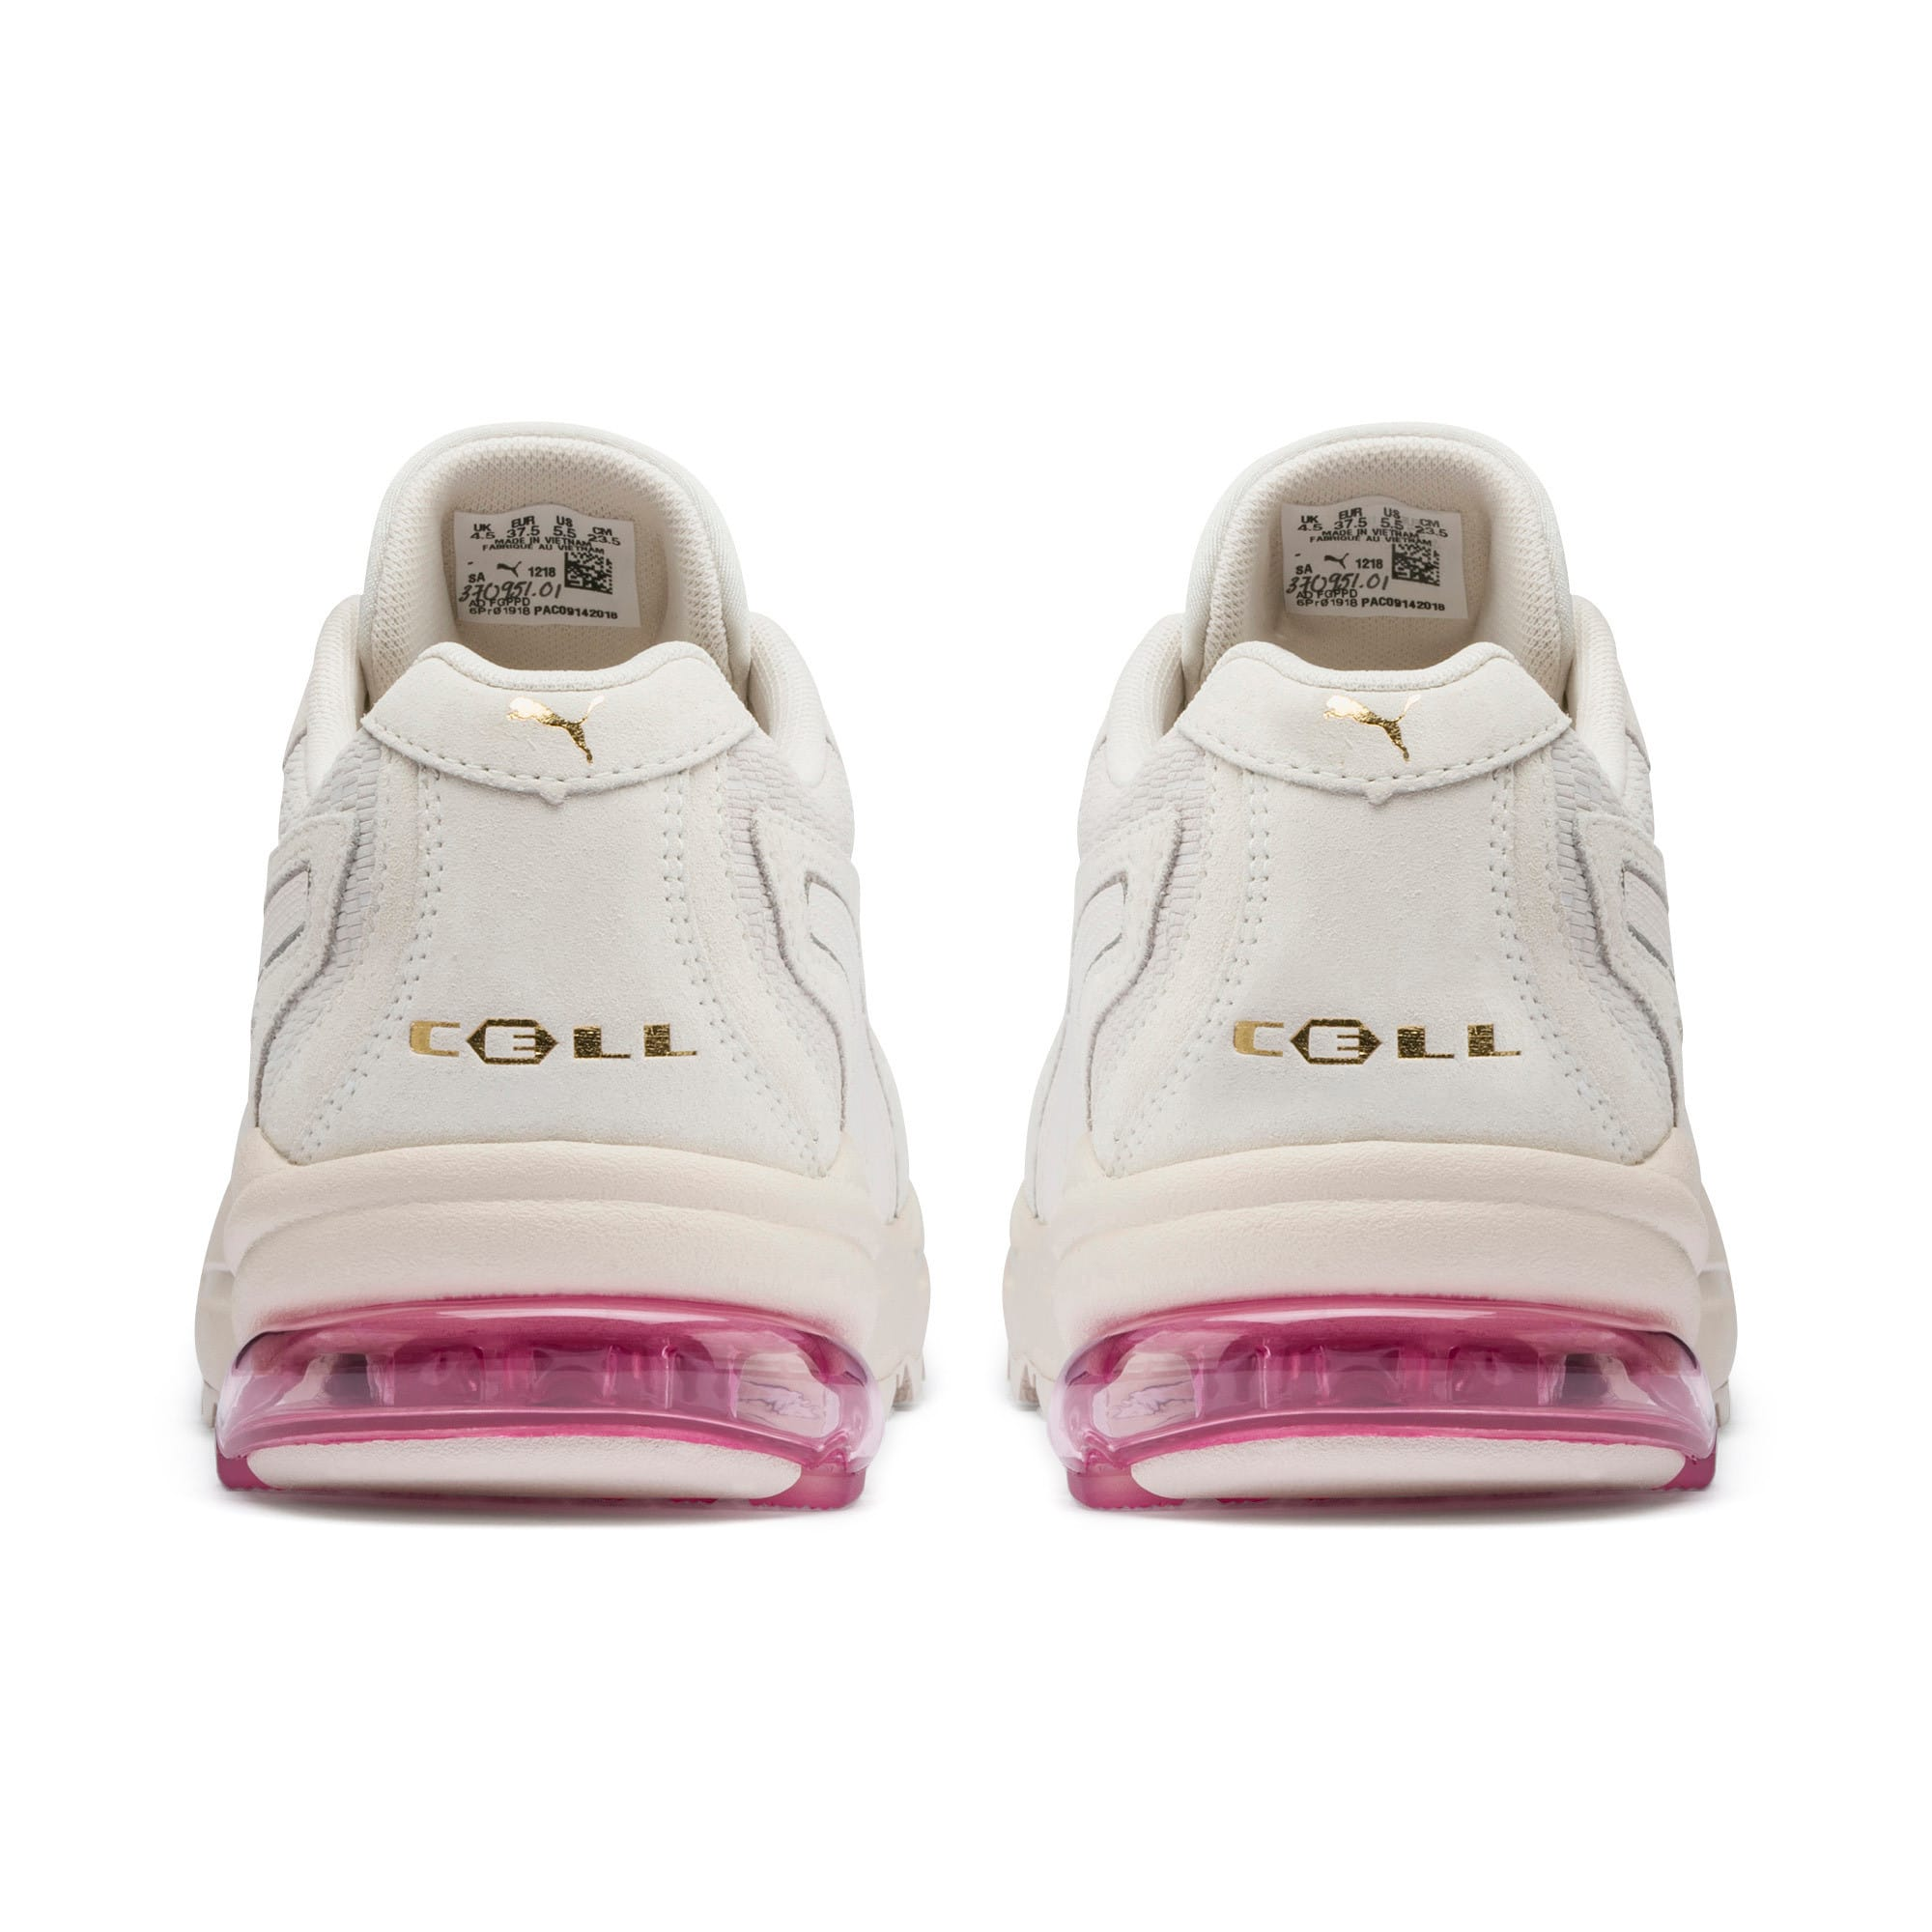 Thumbnail 4 of CELL Stellar Tonal Women's Sneakers, Marshmallow-Puma Team Gold, medium